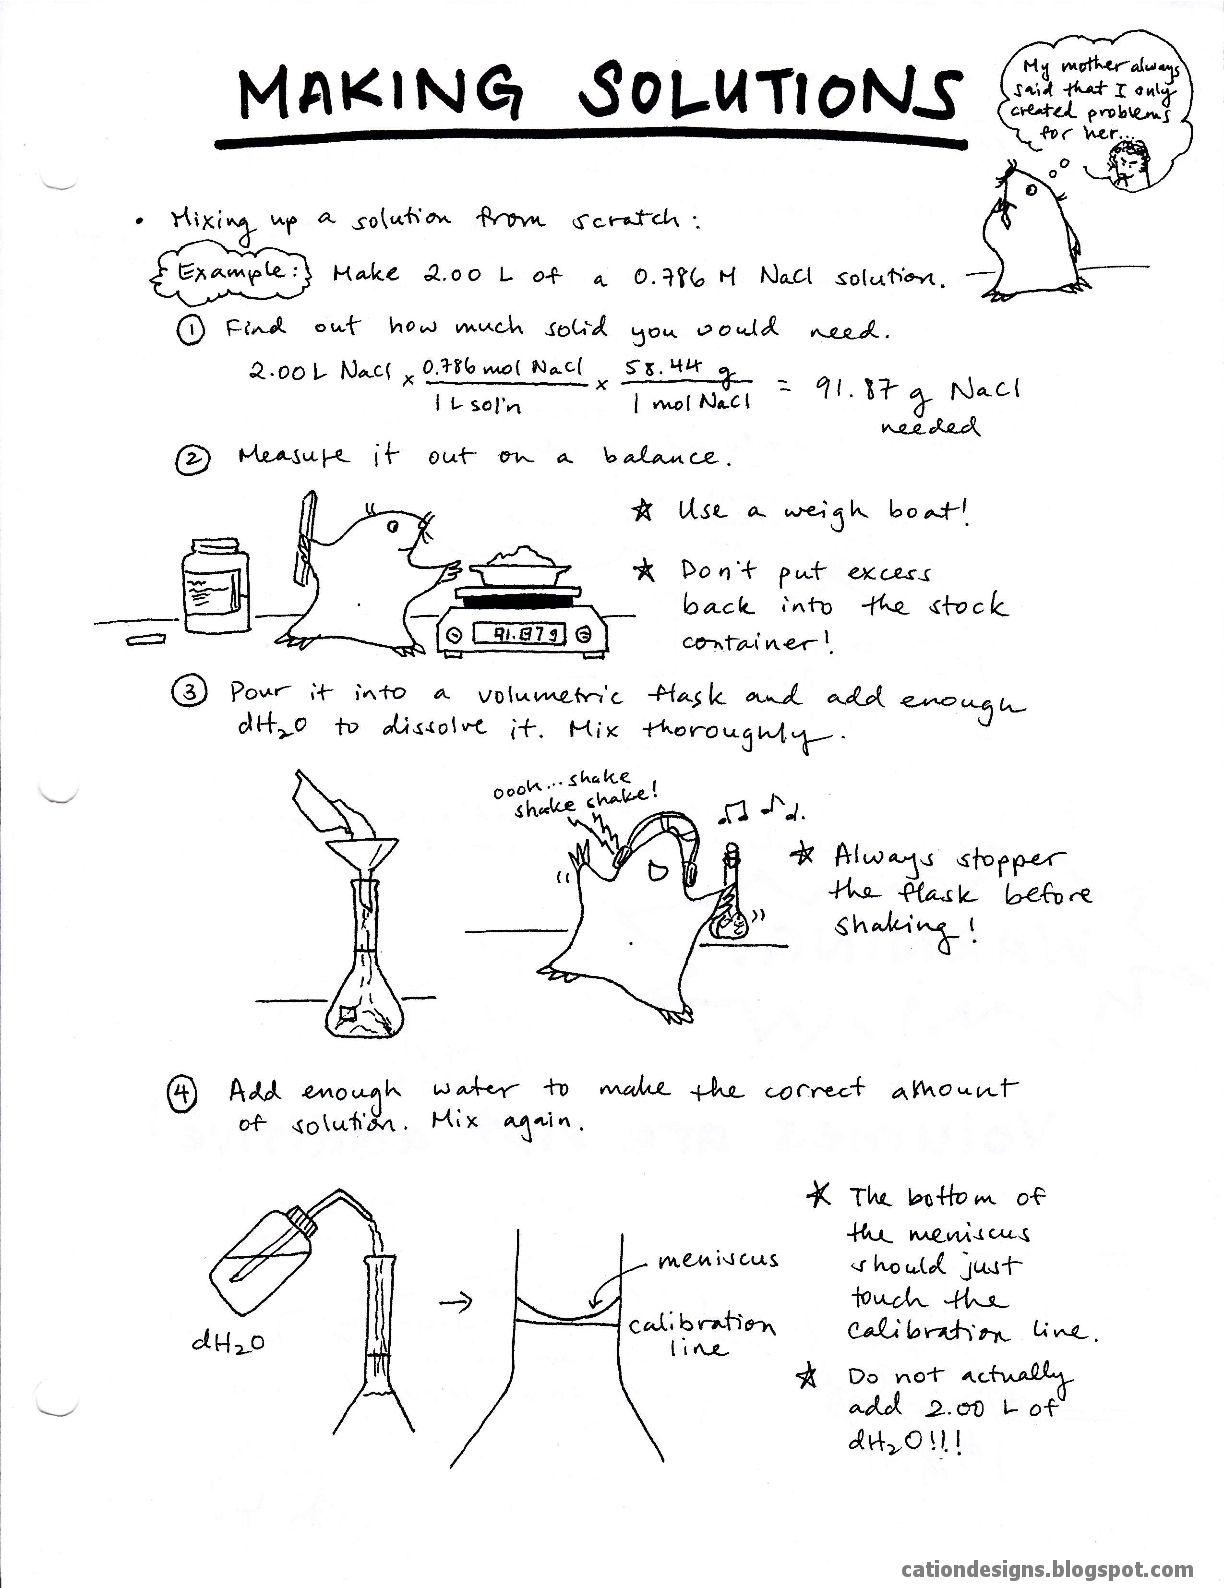 Cation Designs High School Science Teacher Resources